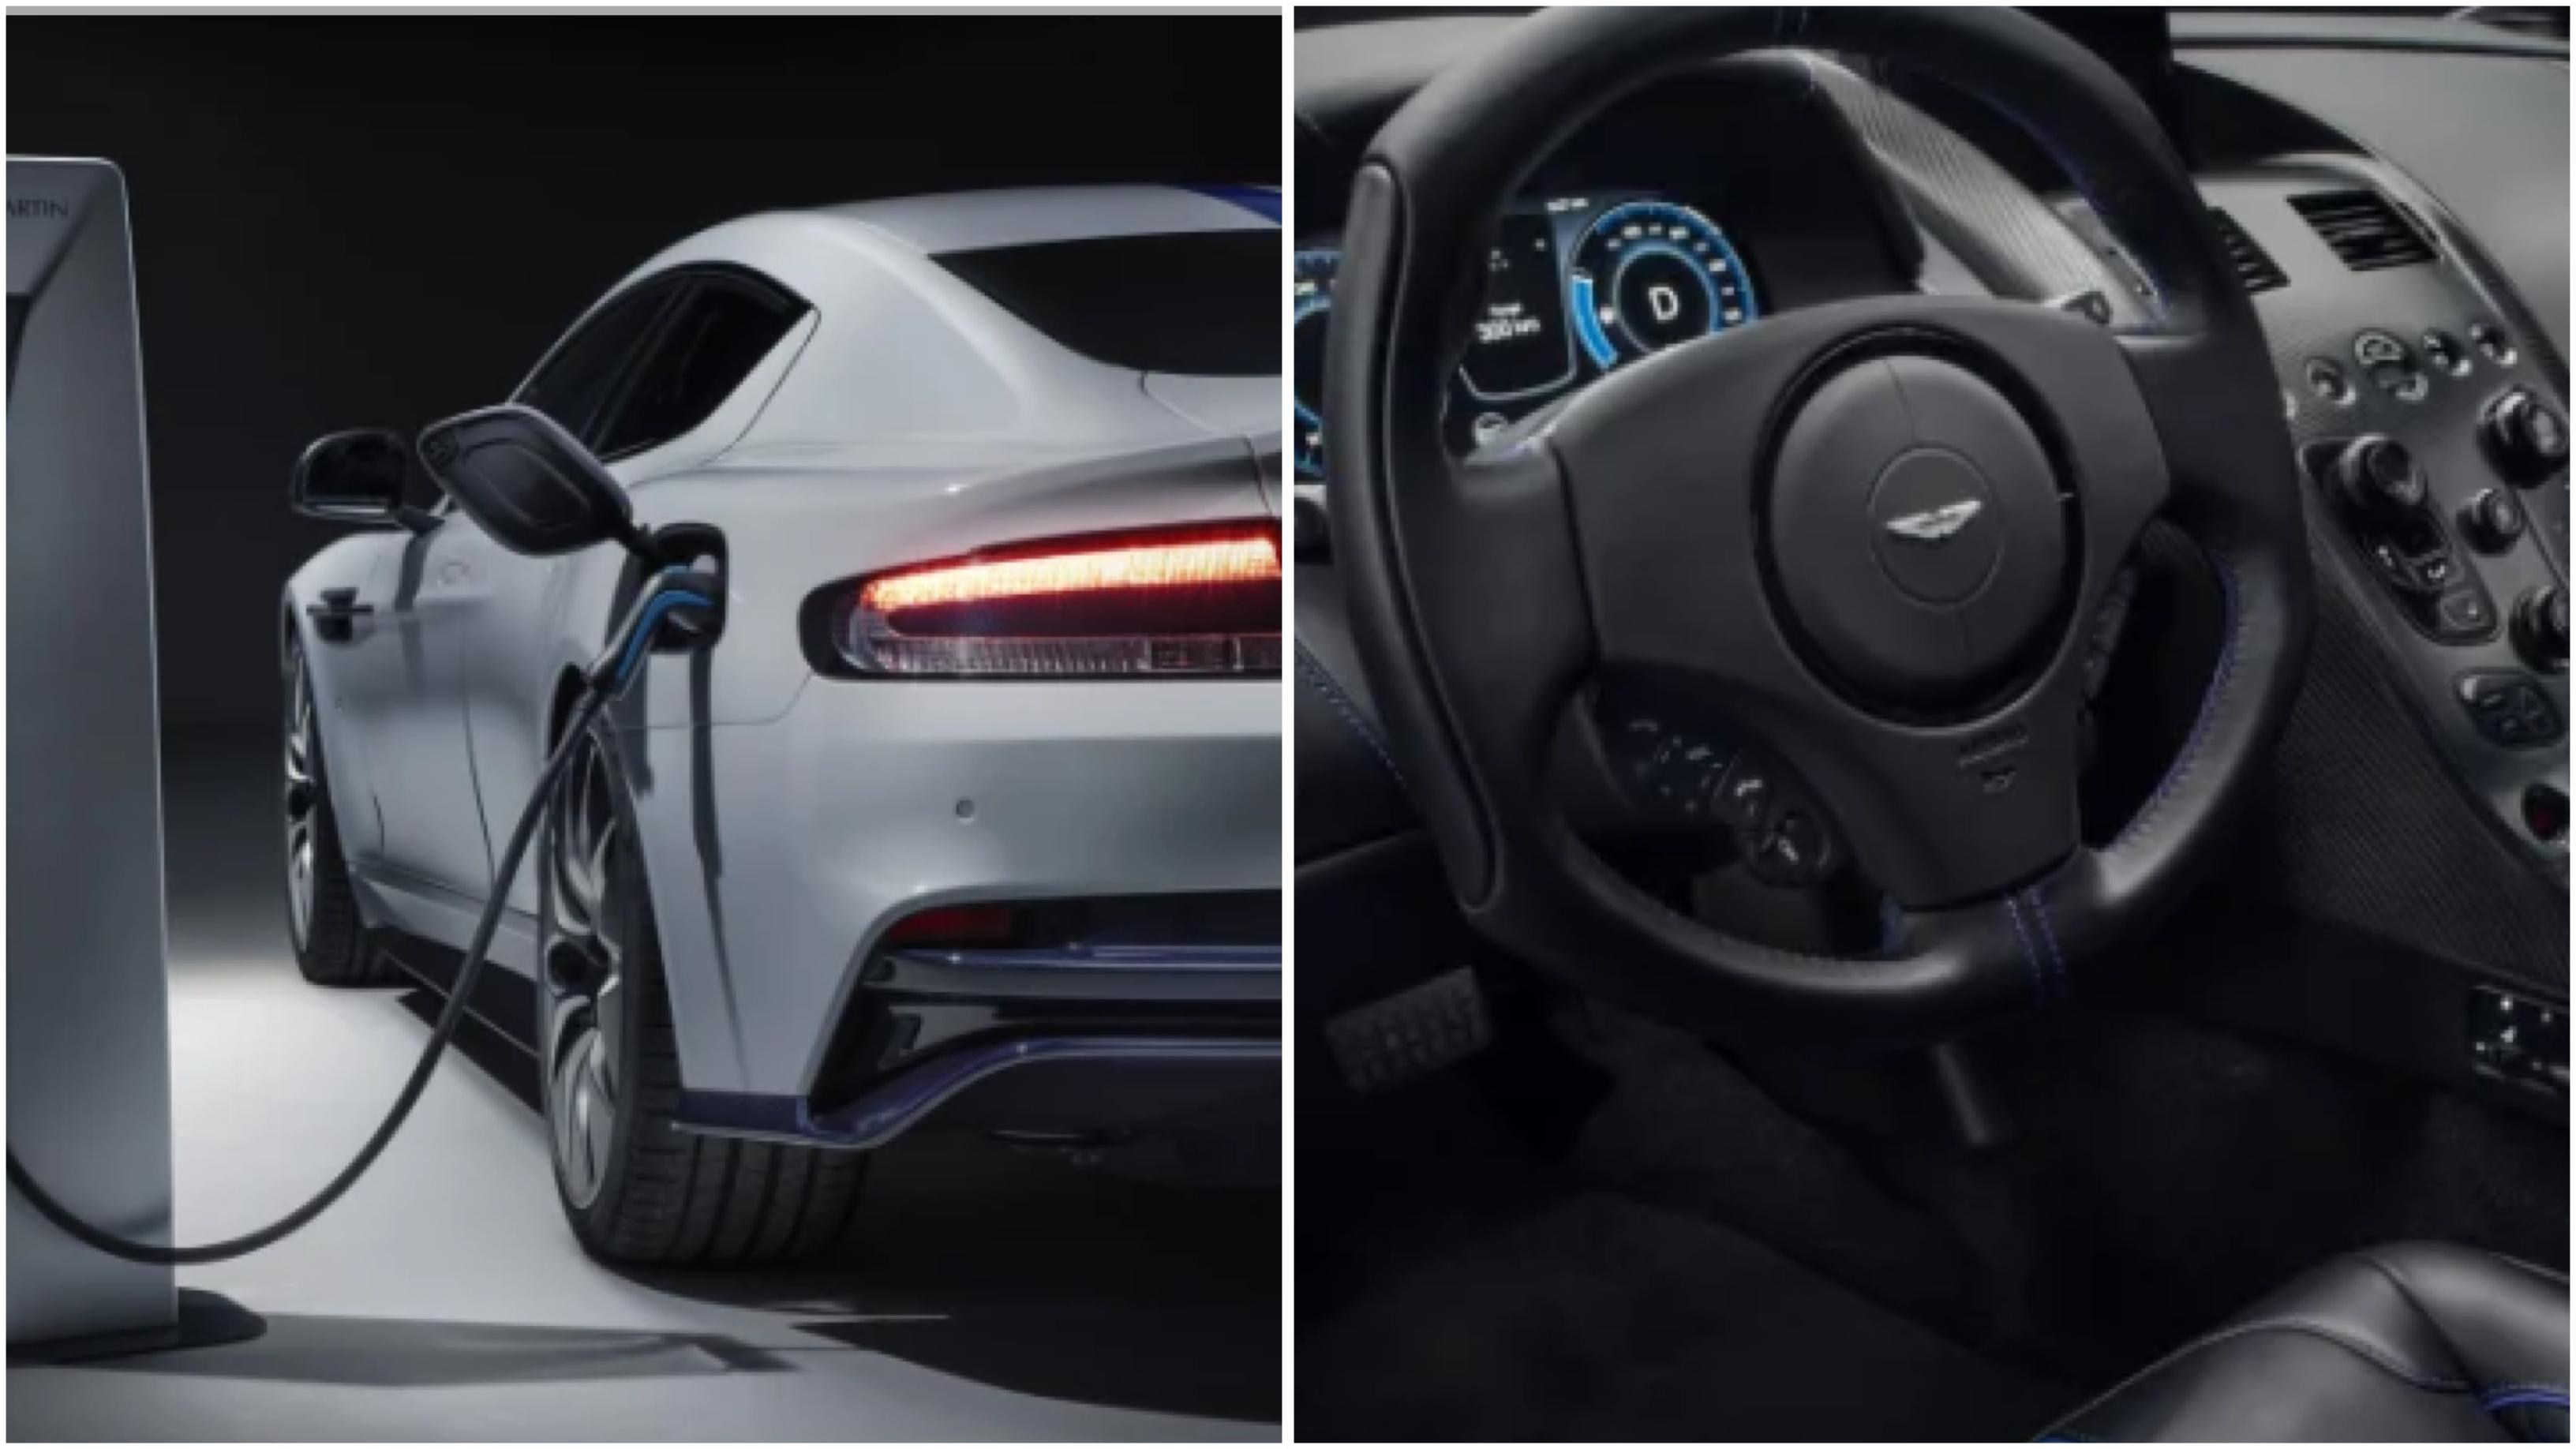 Mobil Listrik Pertama Aston Martin Segera Dirilis